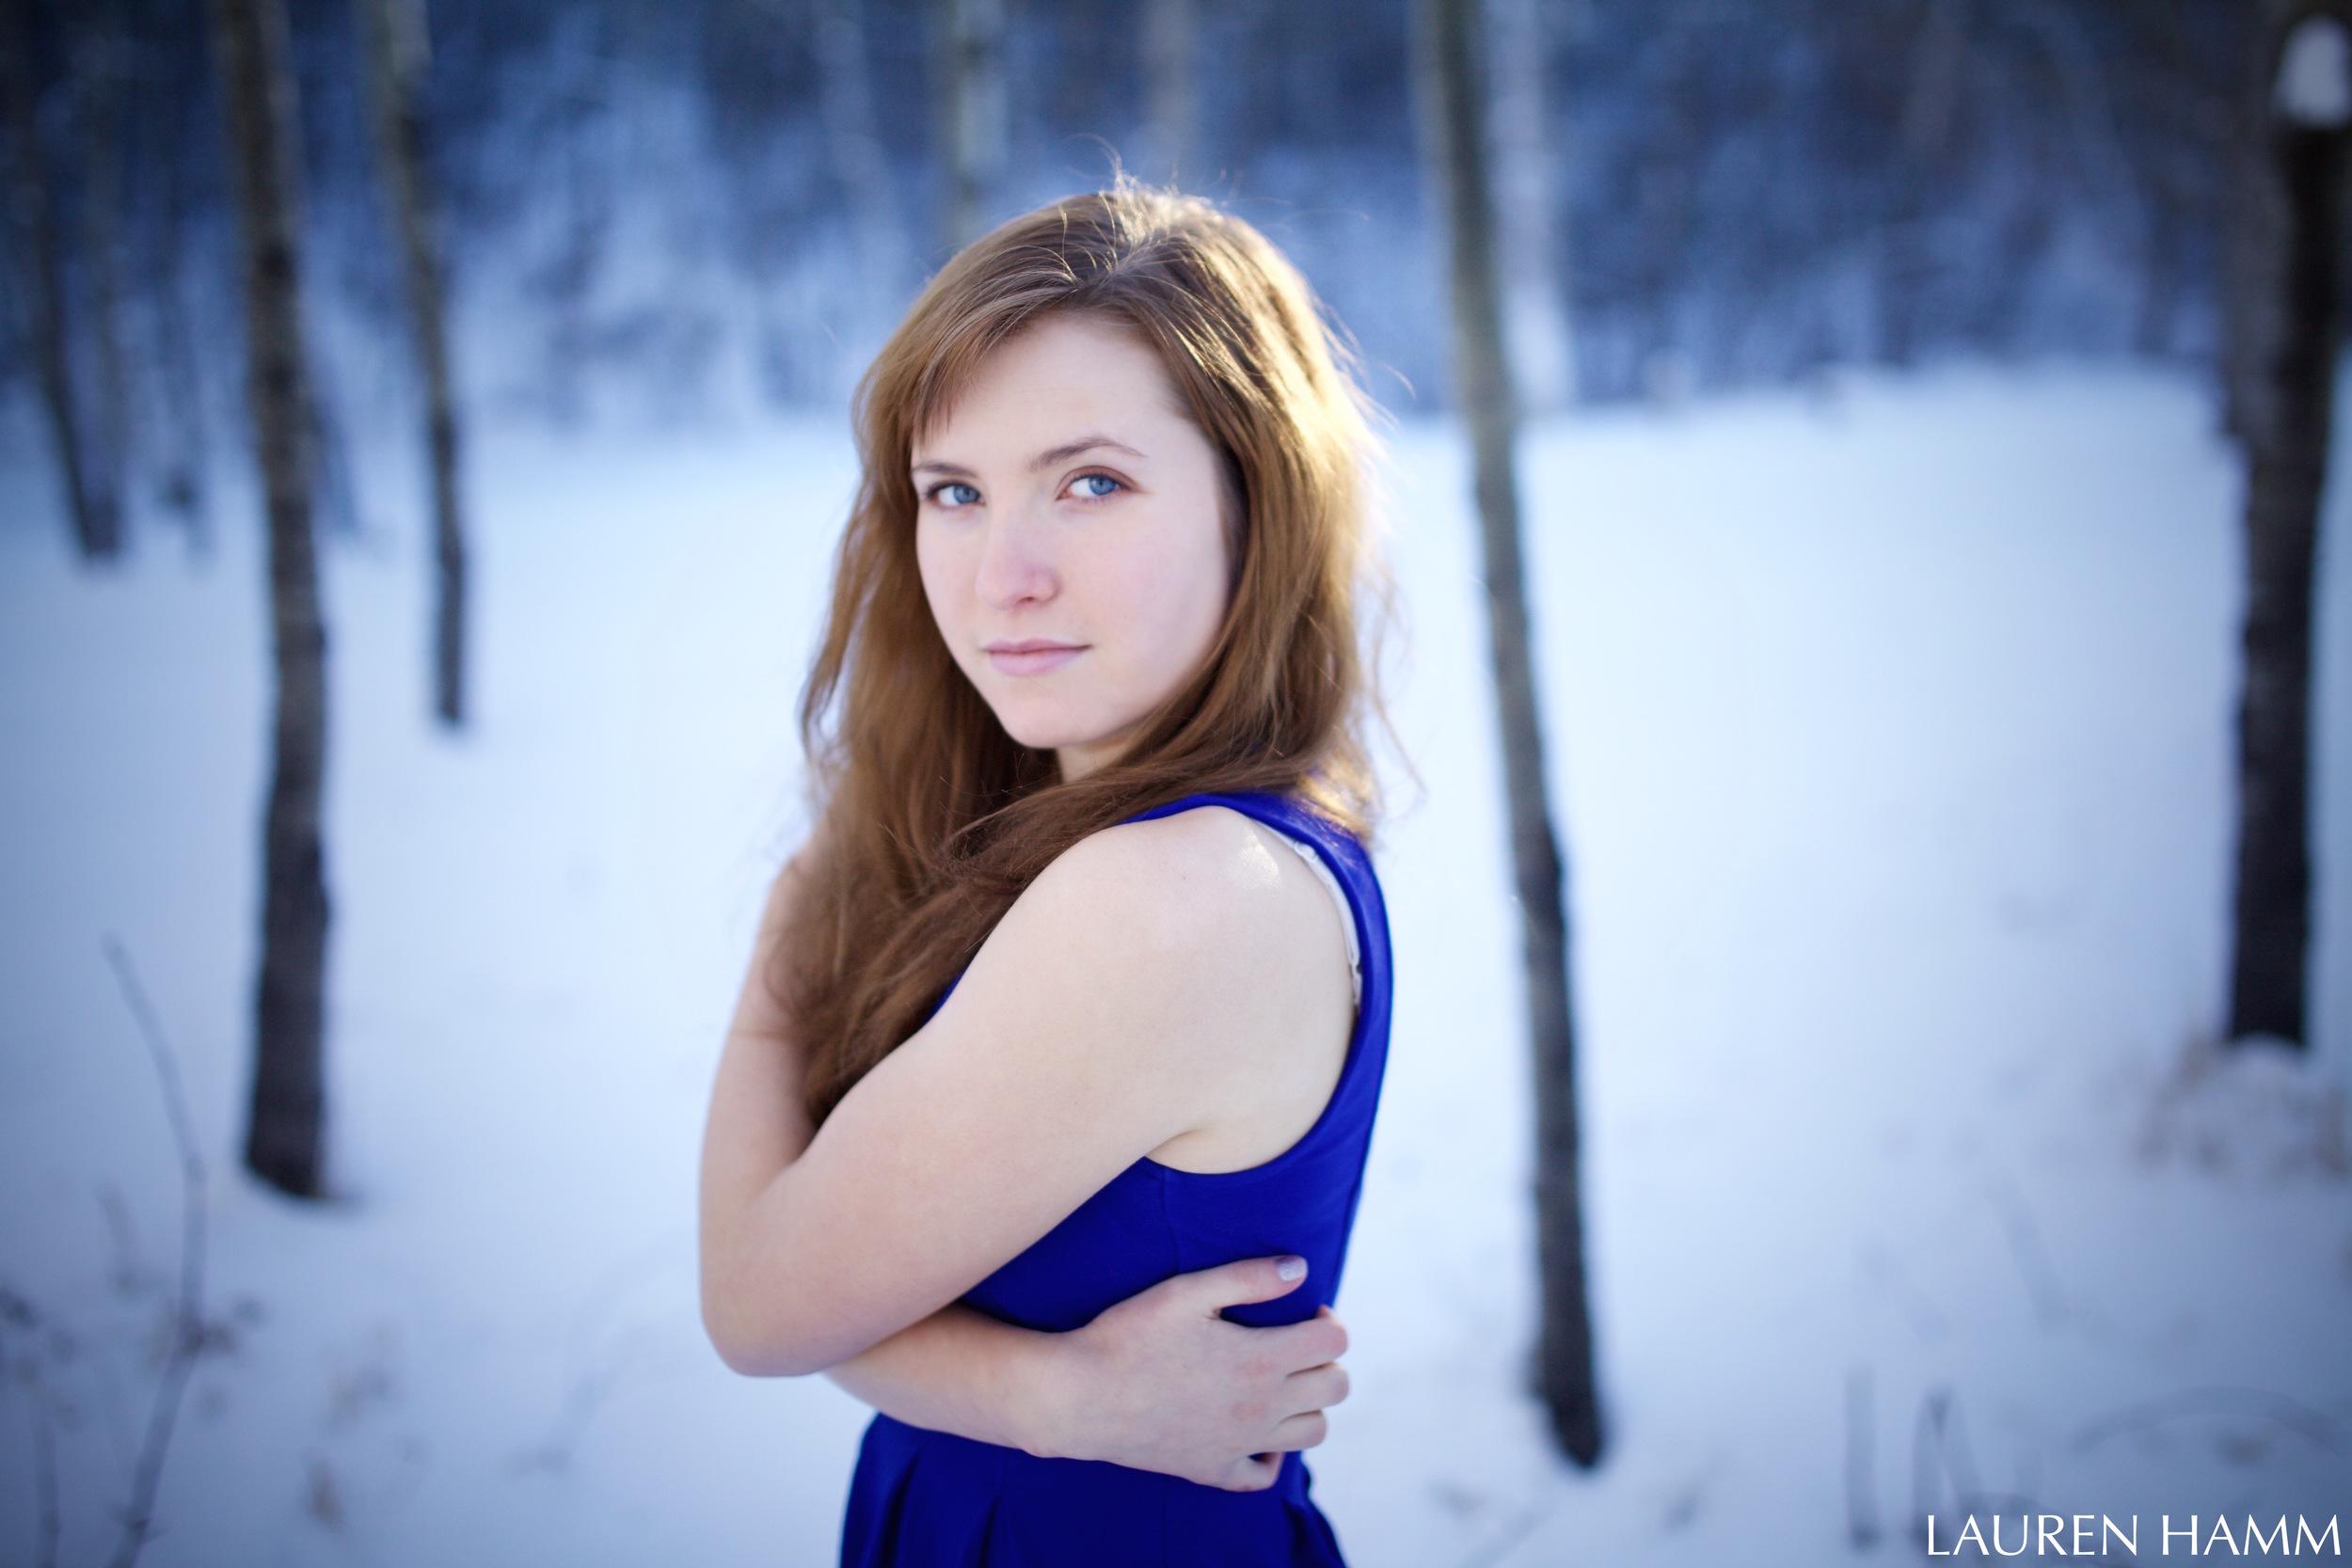 Caitlyn O'Connor | Portrait | Headshot Photography| | Lifestyle Photoshoot | Alberta Photographer | YYC | Lauren Hamm Photography